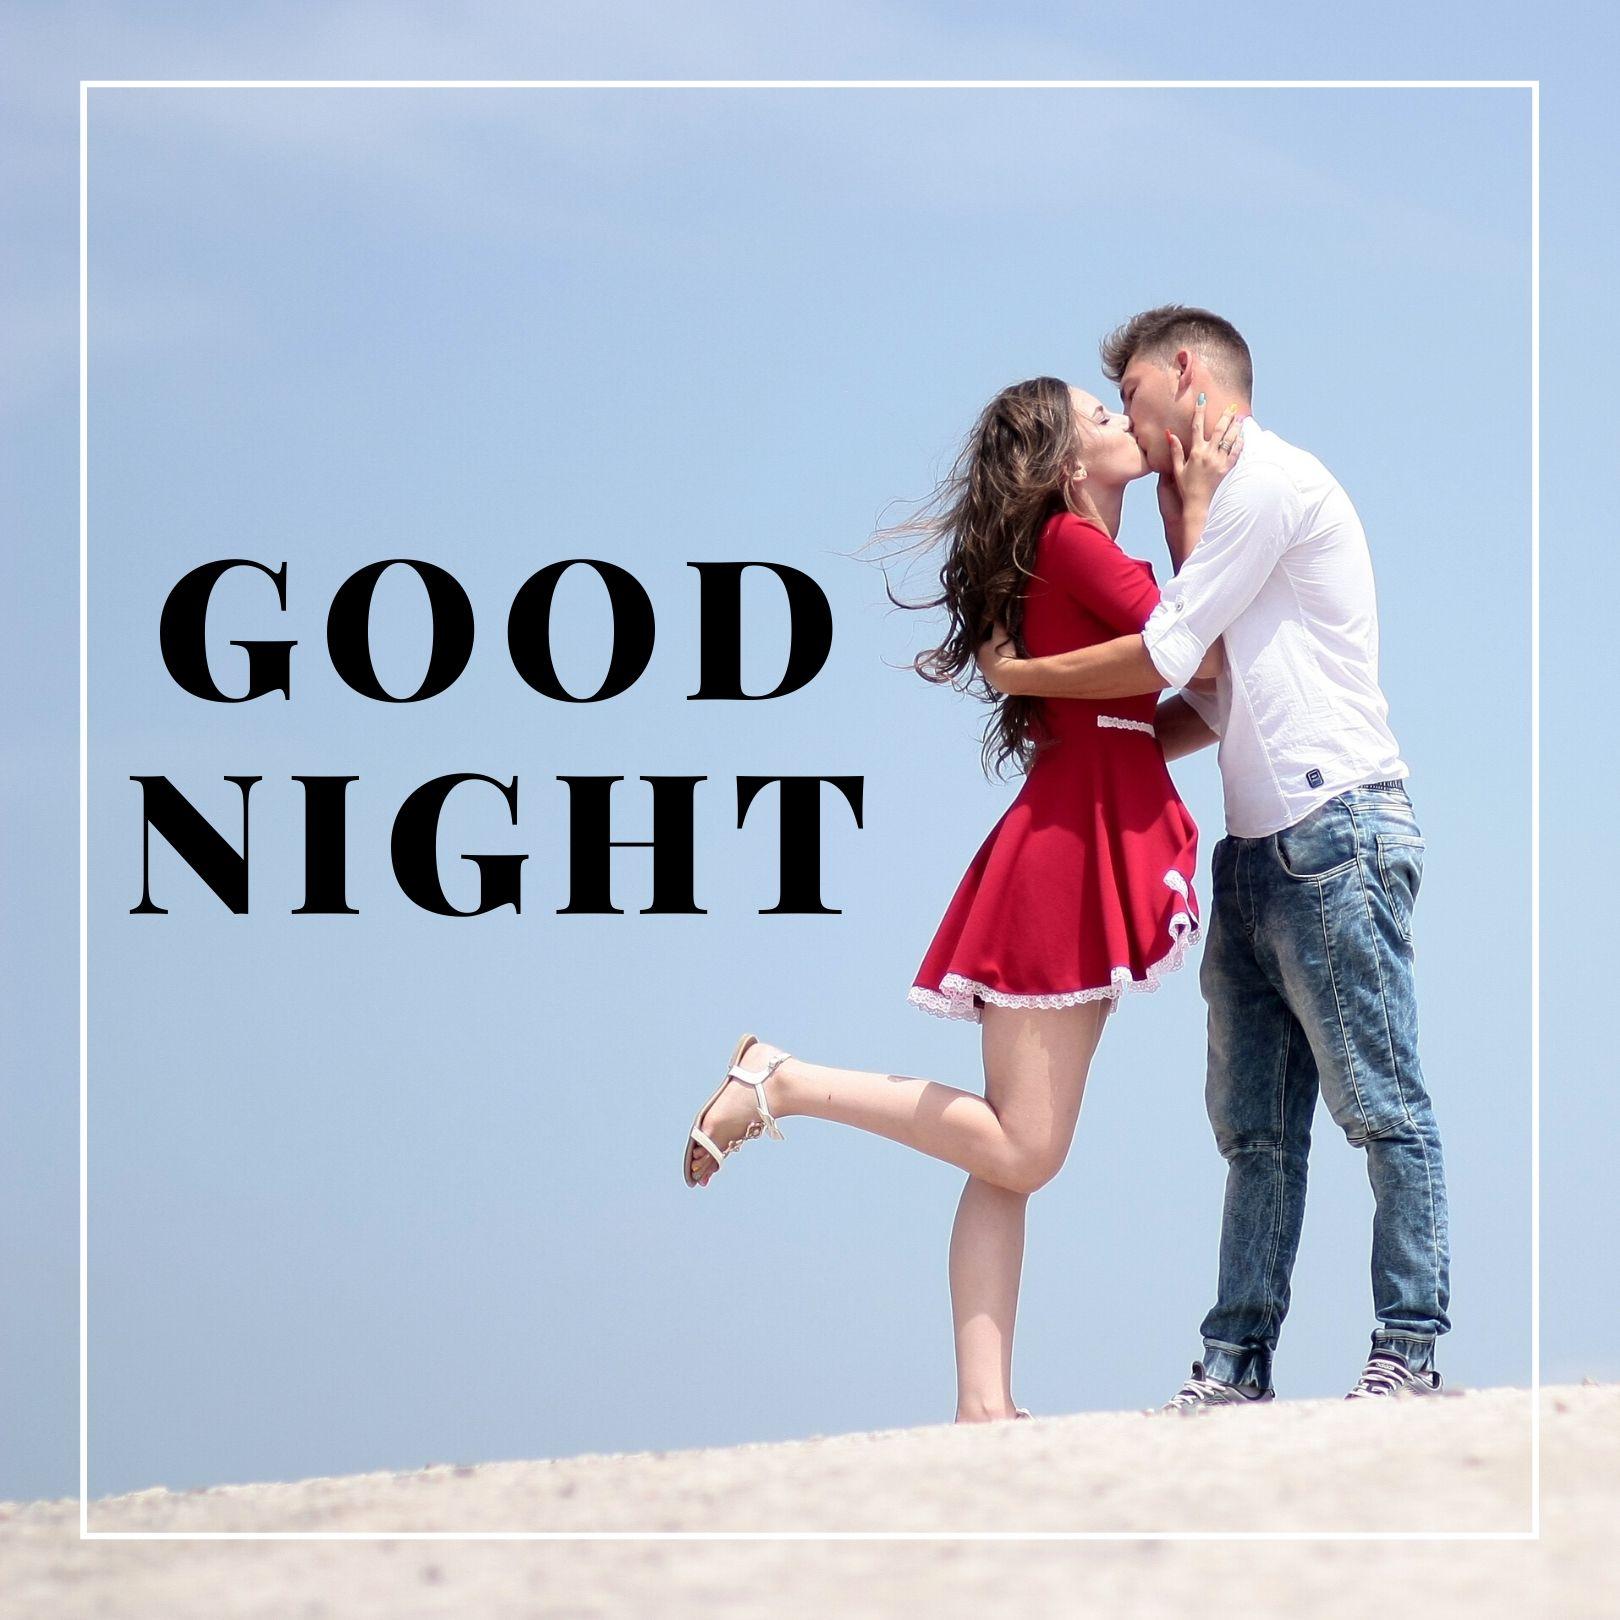 Good Night Kiss image full HD free download.